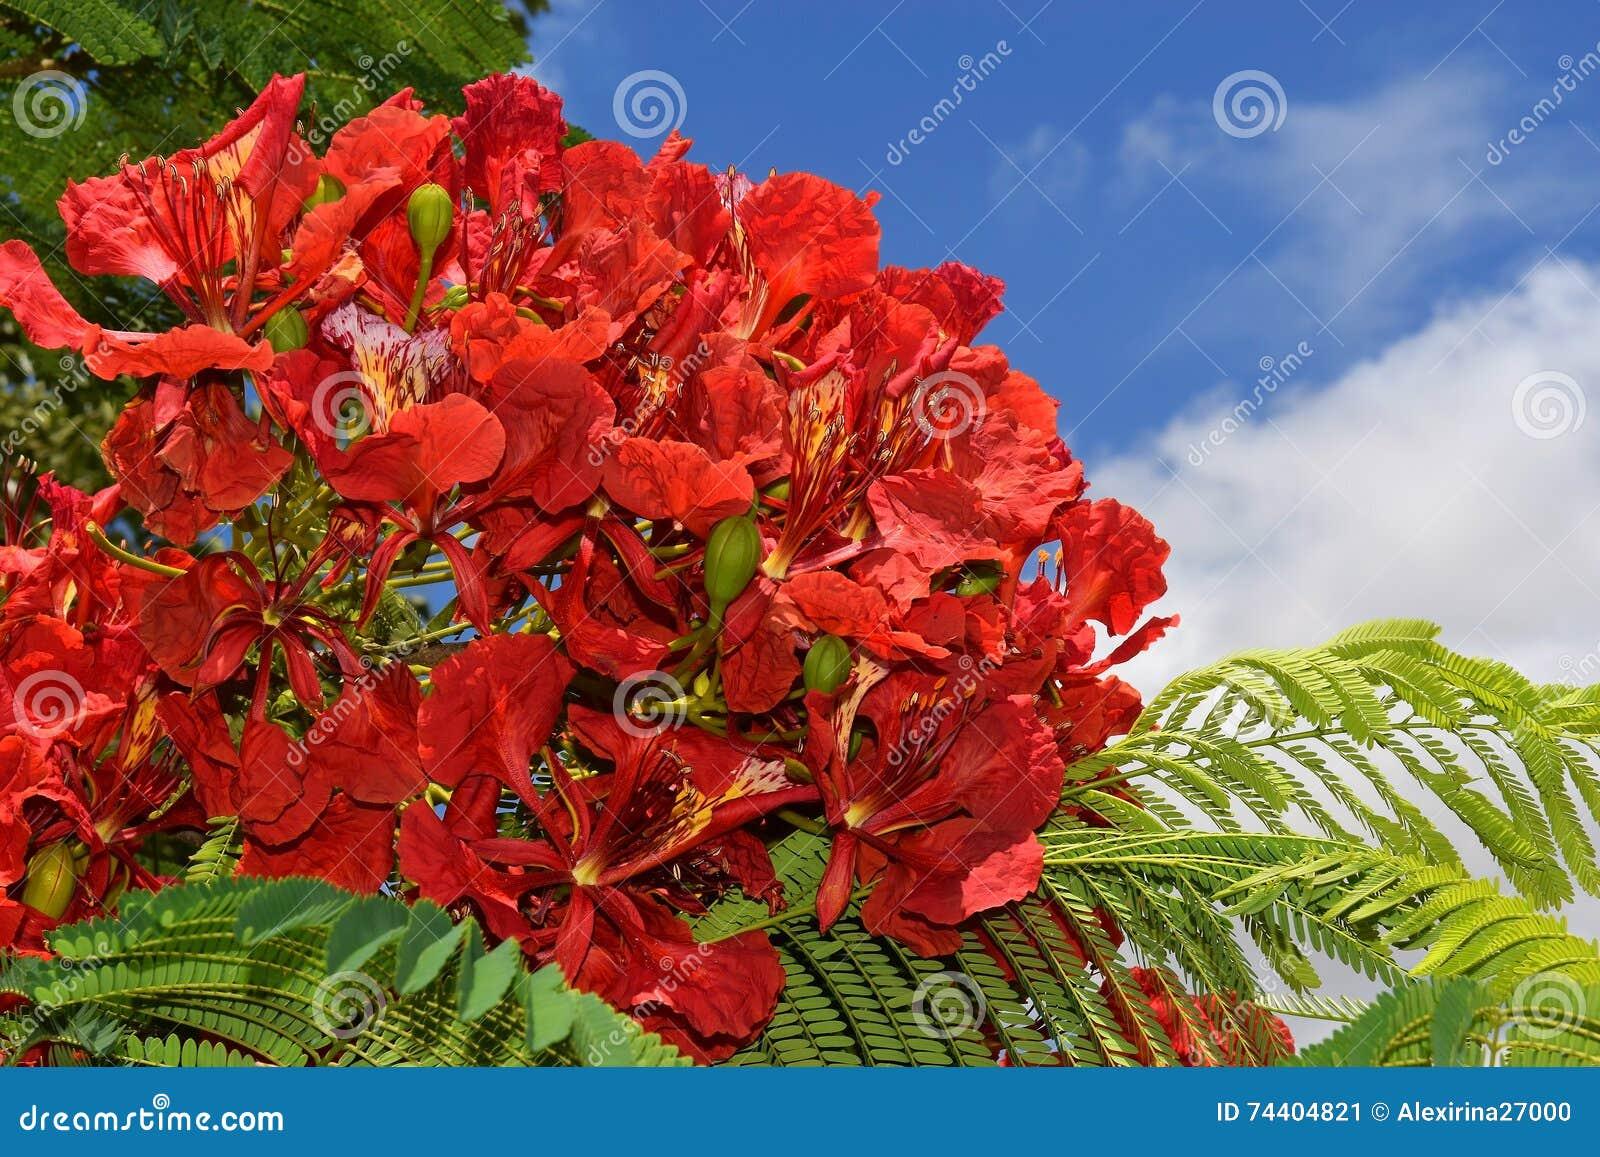 Scarlet Flowers Of Mediterranean Acacia Stock Image - Image of ...